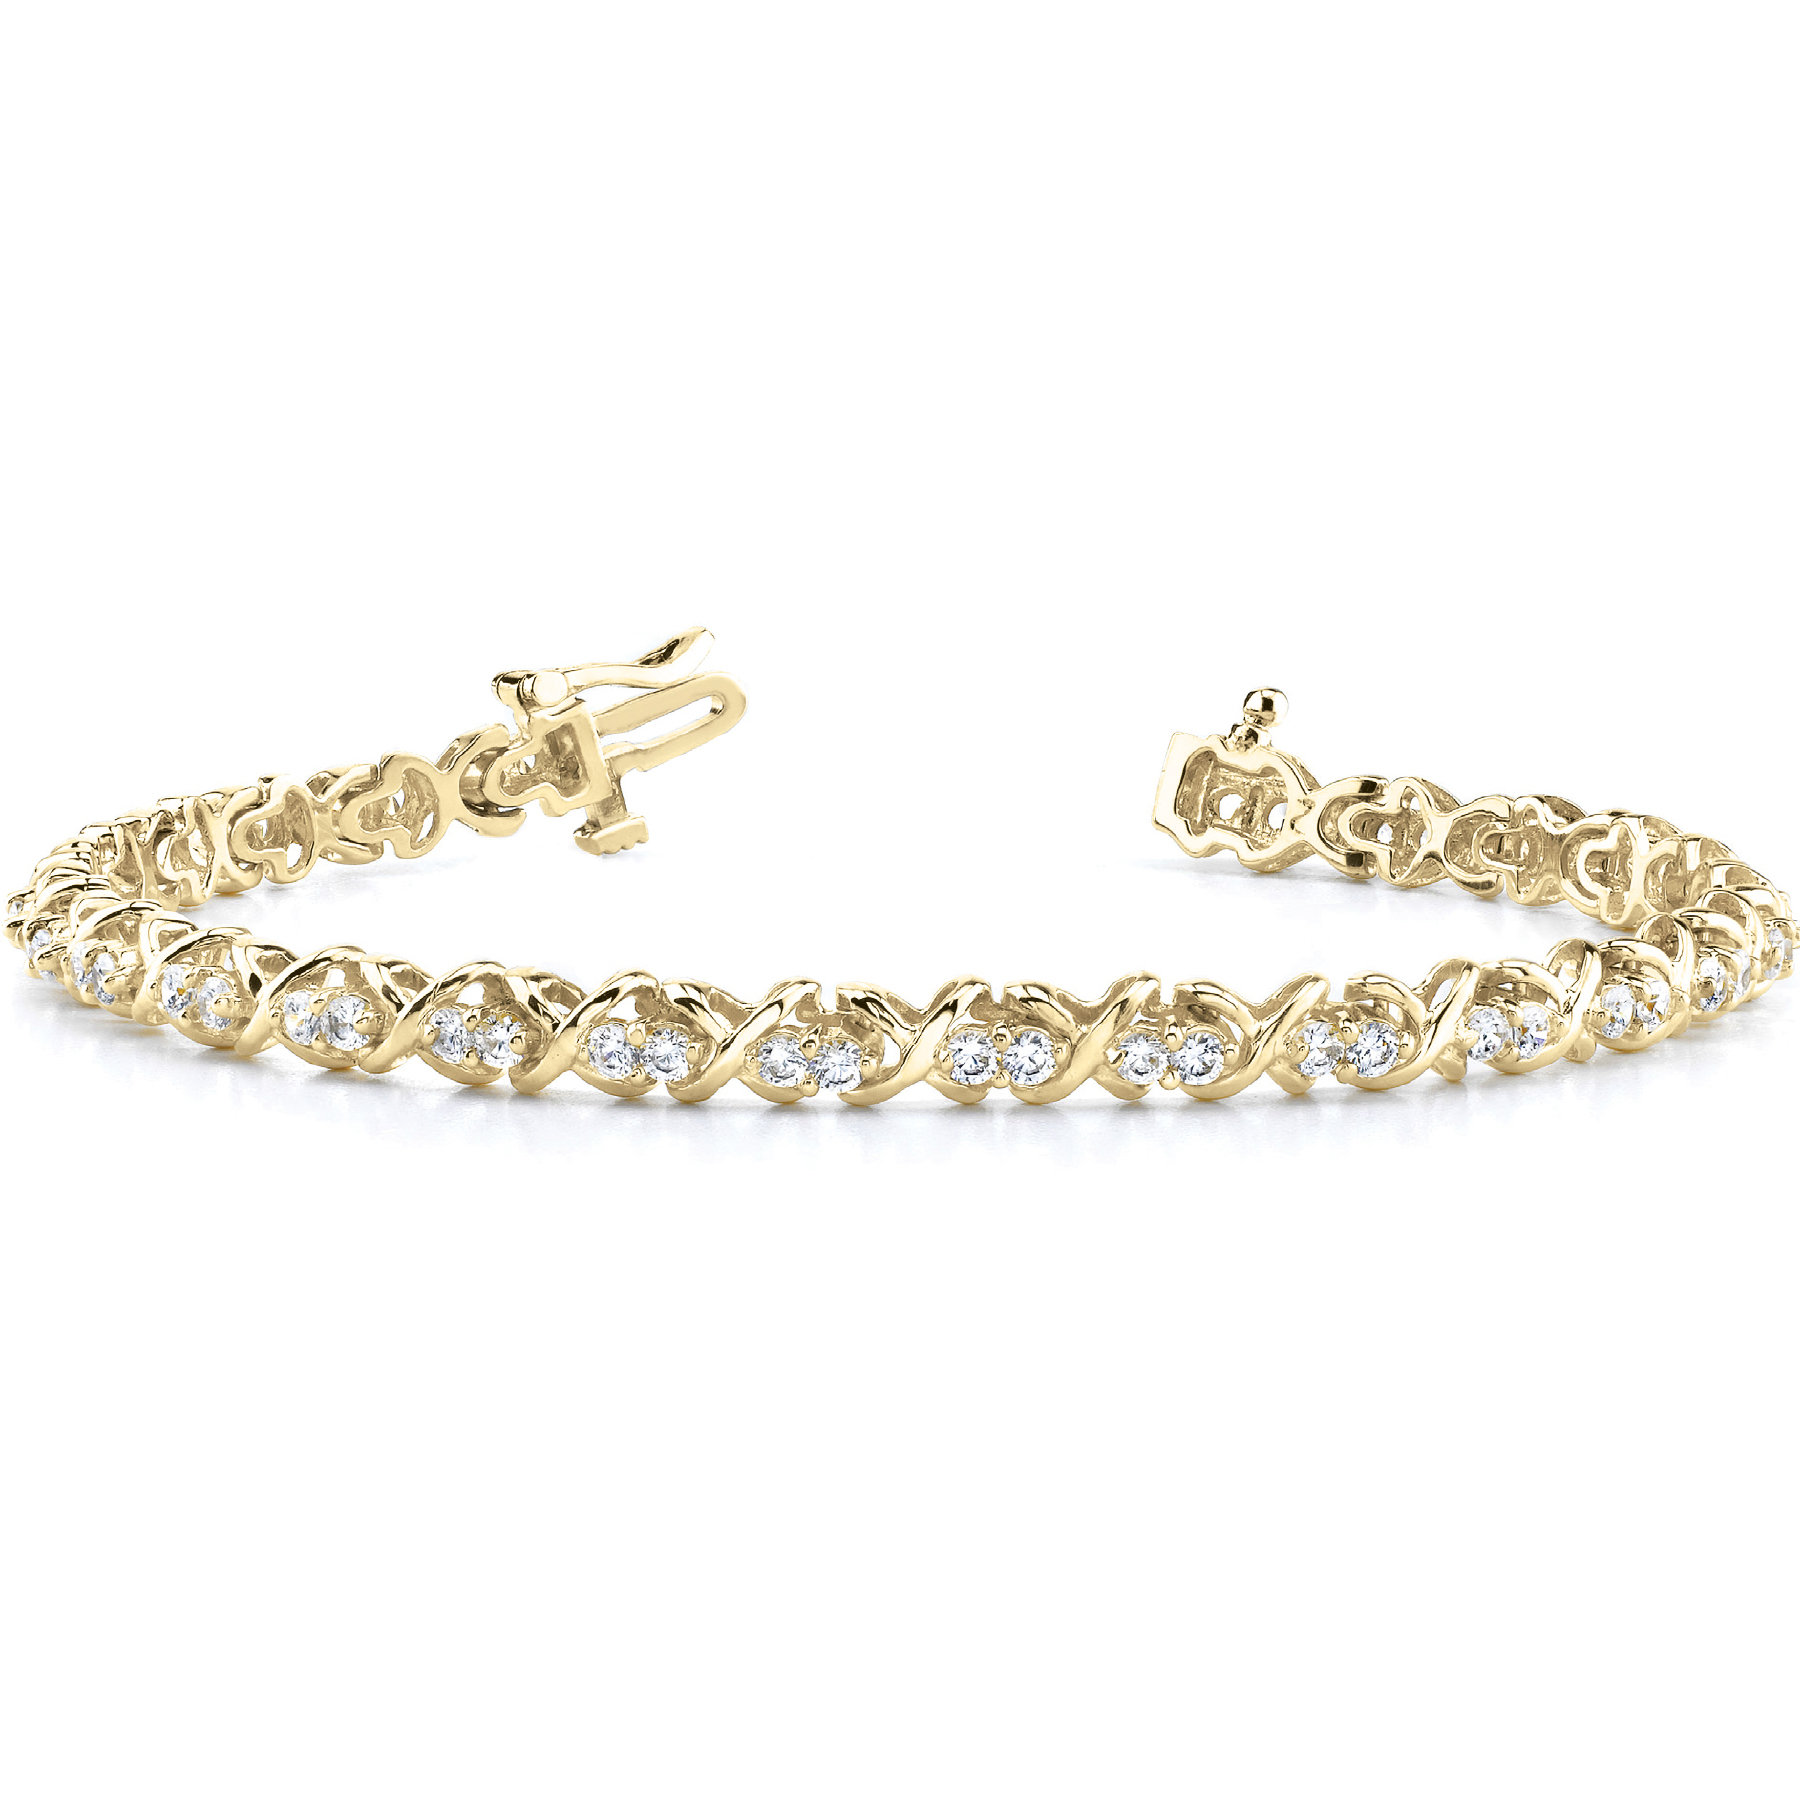 18k-yellow-gold-xo-tennis-diamond-bracelet-4485-01-25